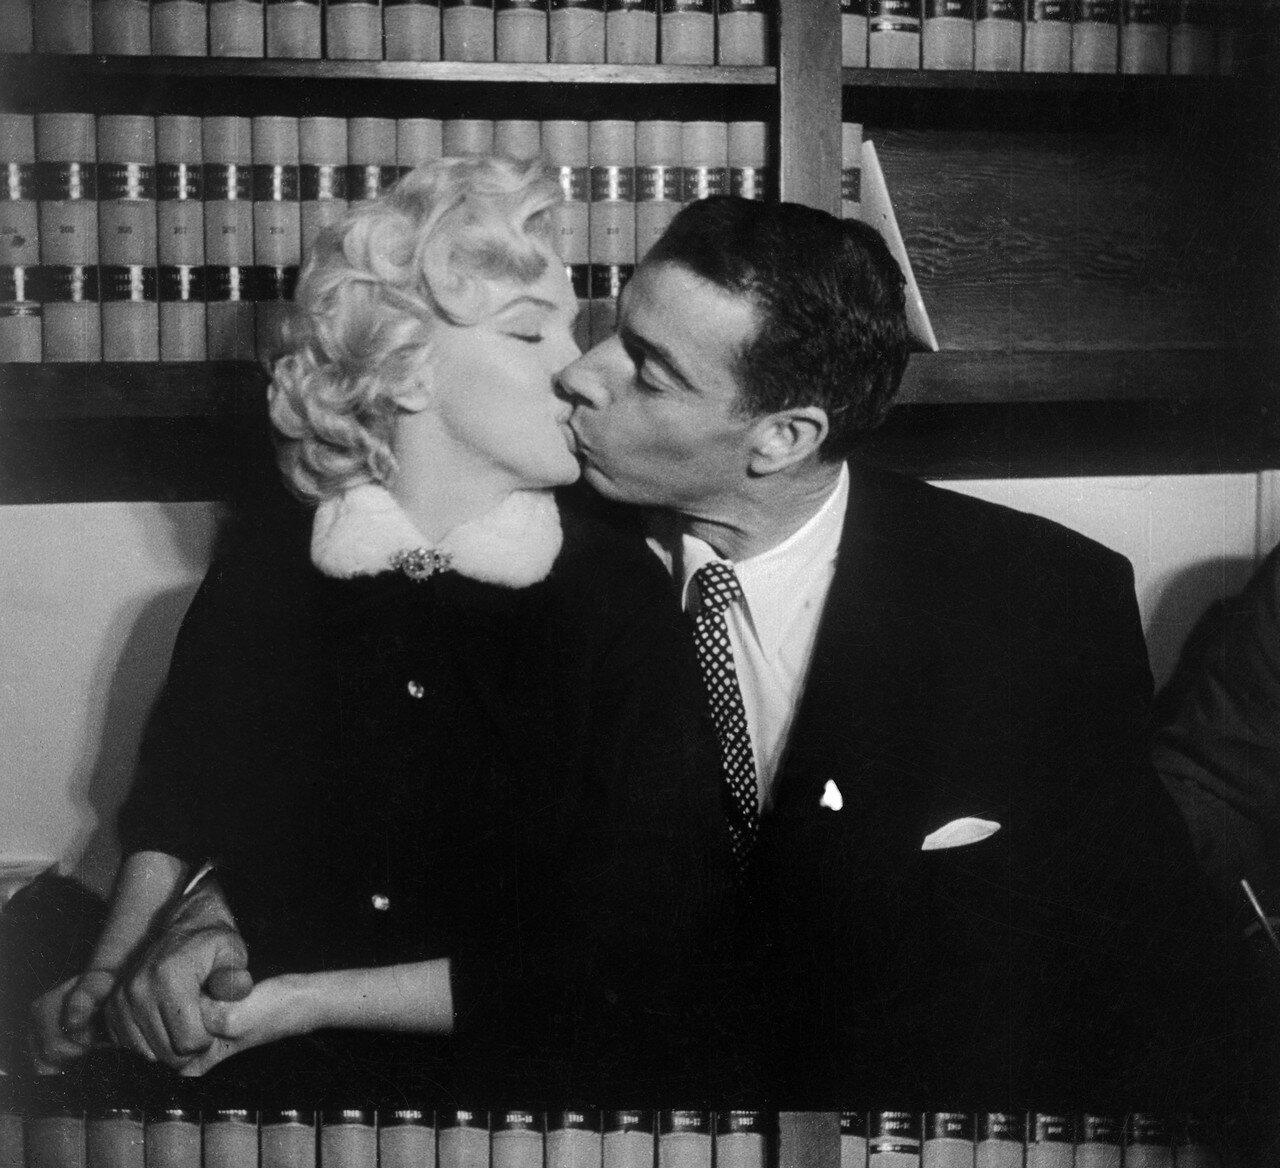 Marilyn Monroe Kissing Joe DiMaggio